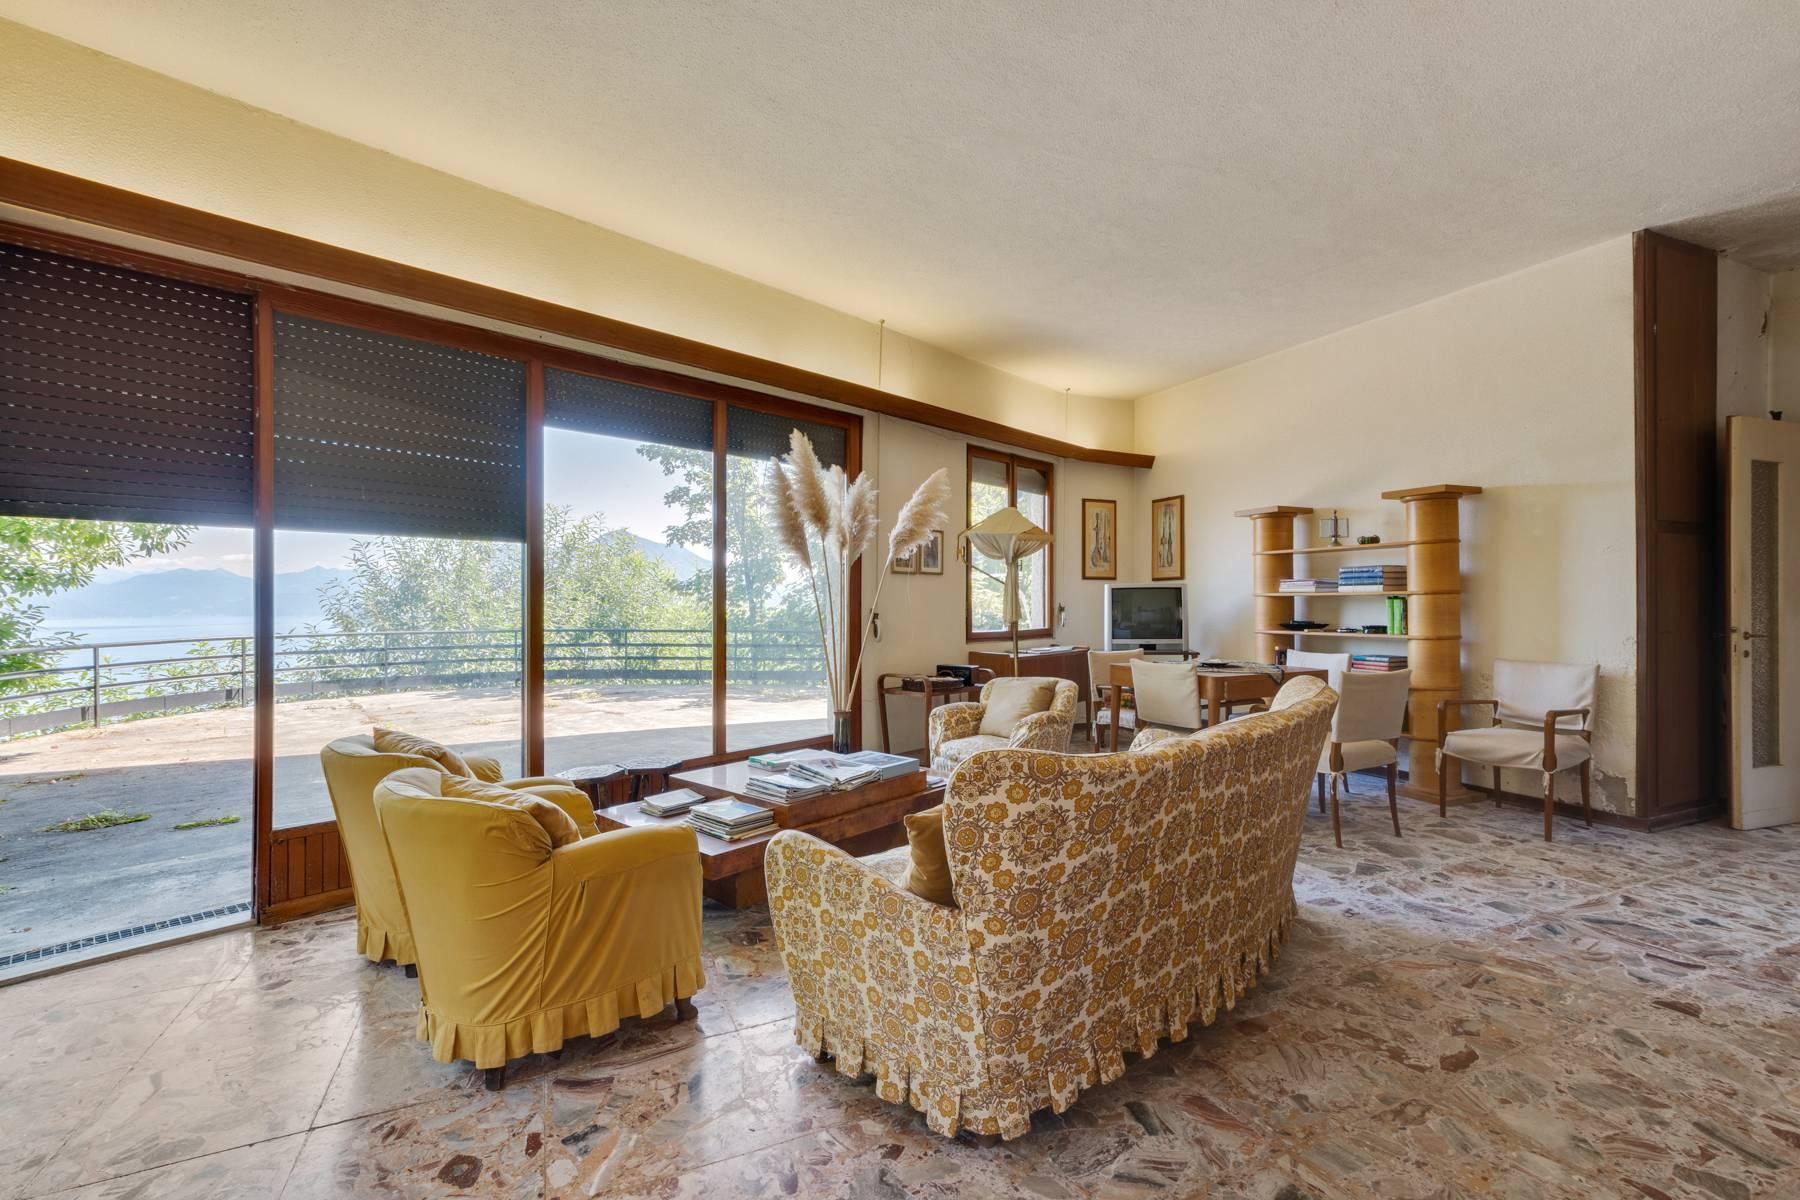 Villa in Vendita a Stresa: 5 locali, 150 mq - Foto 8